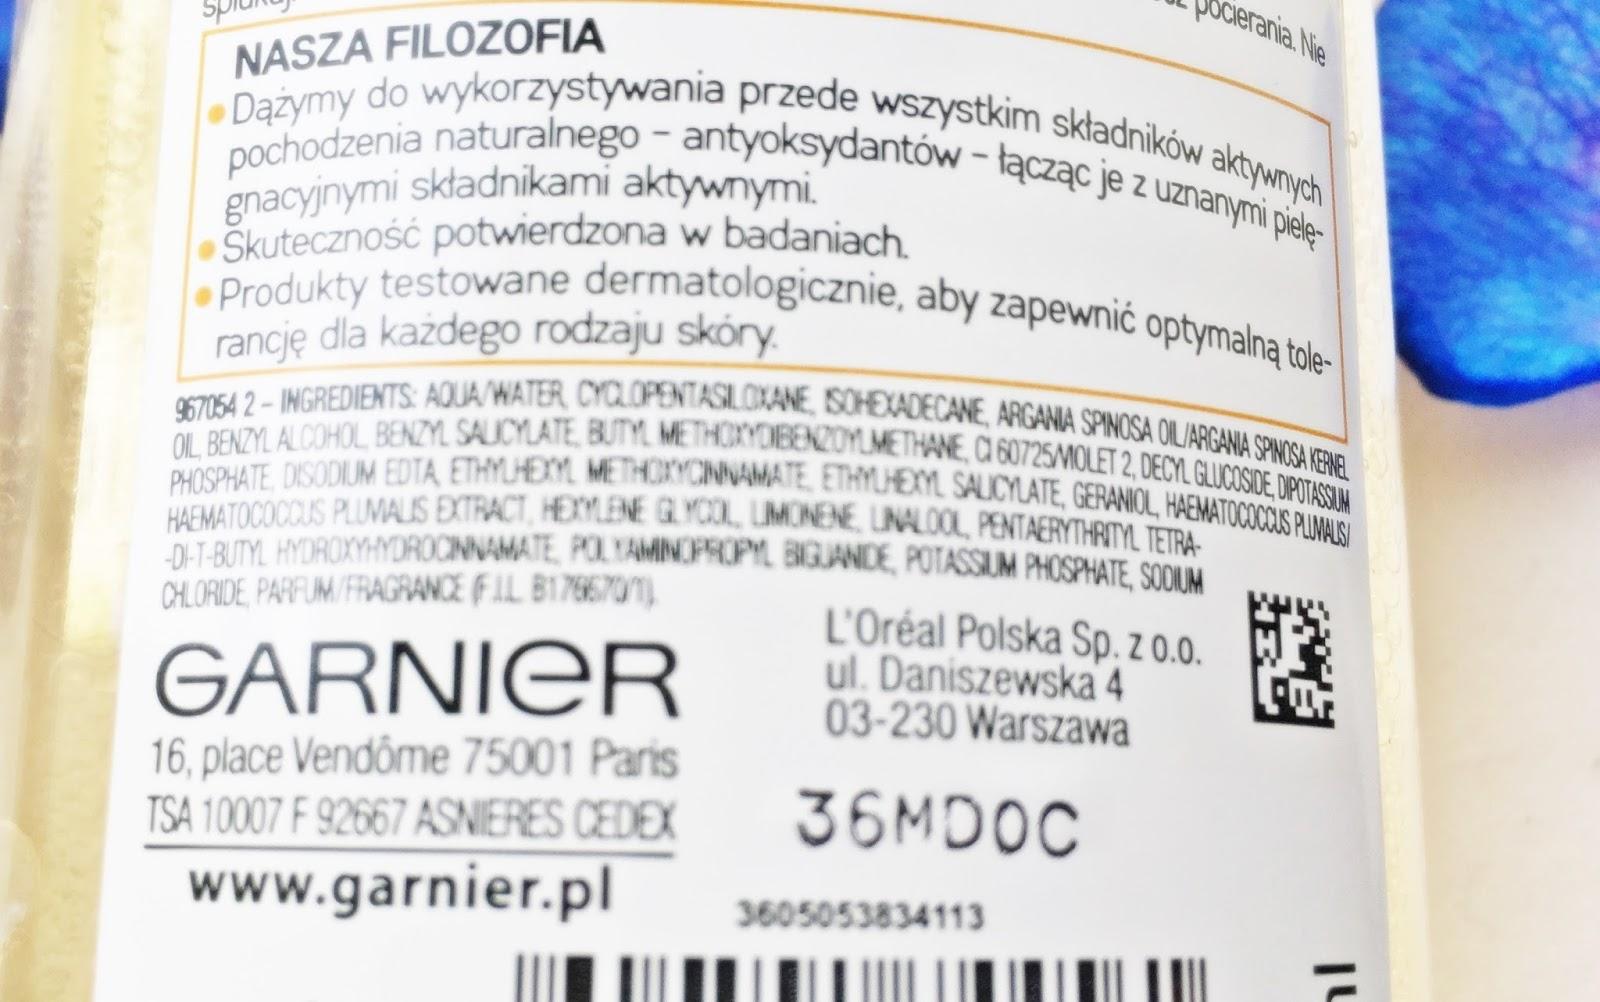 Płyn micelarny z olejkiem Garnier, olejek arganowy skład beautypediapatt